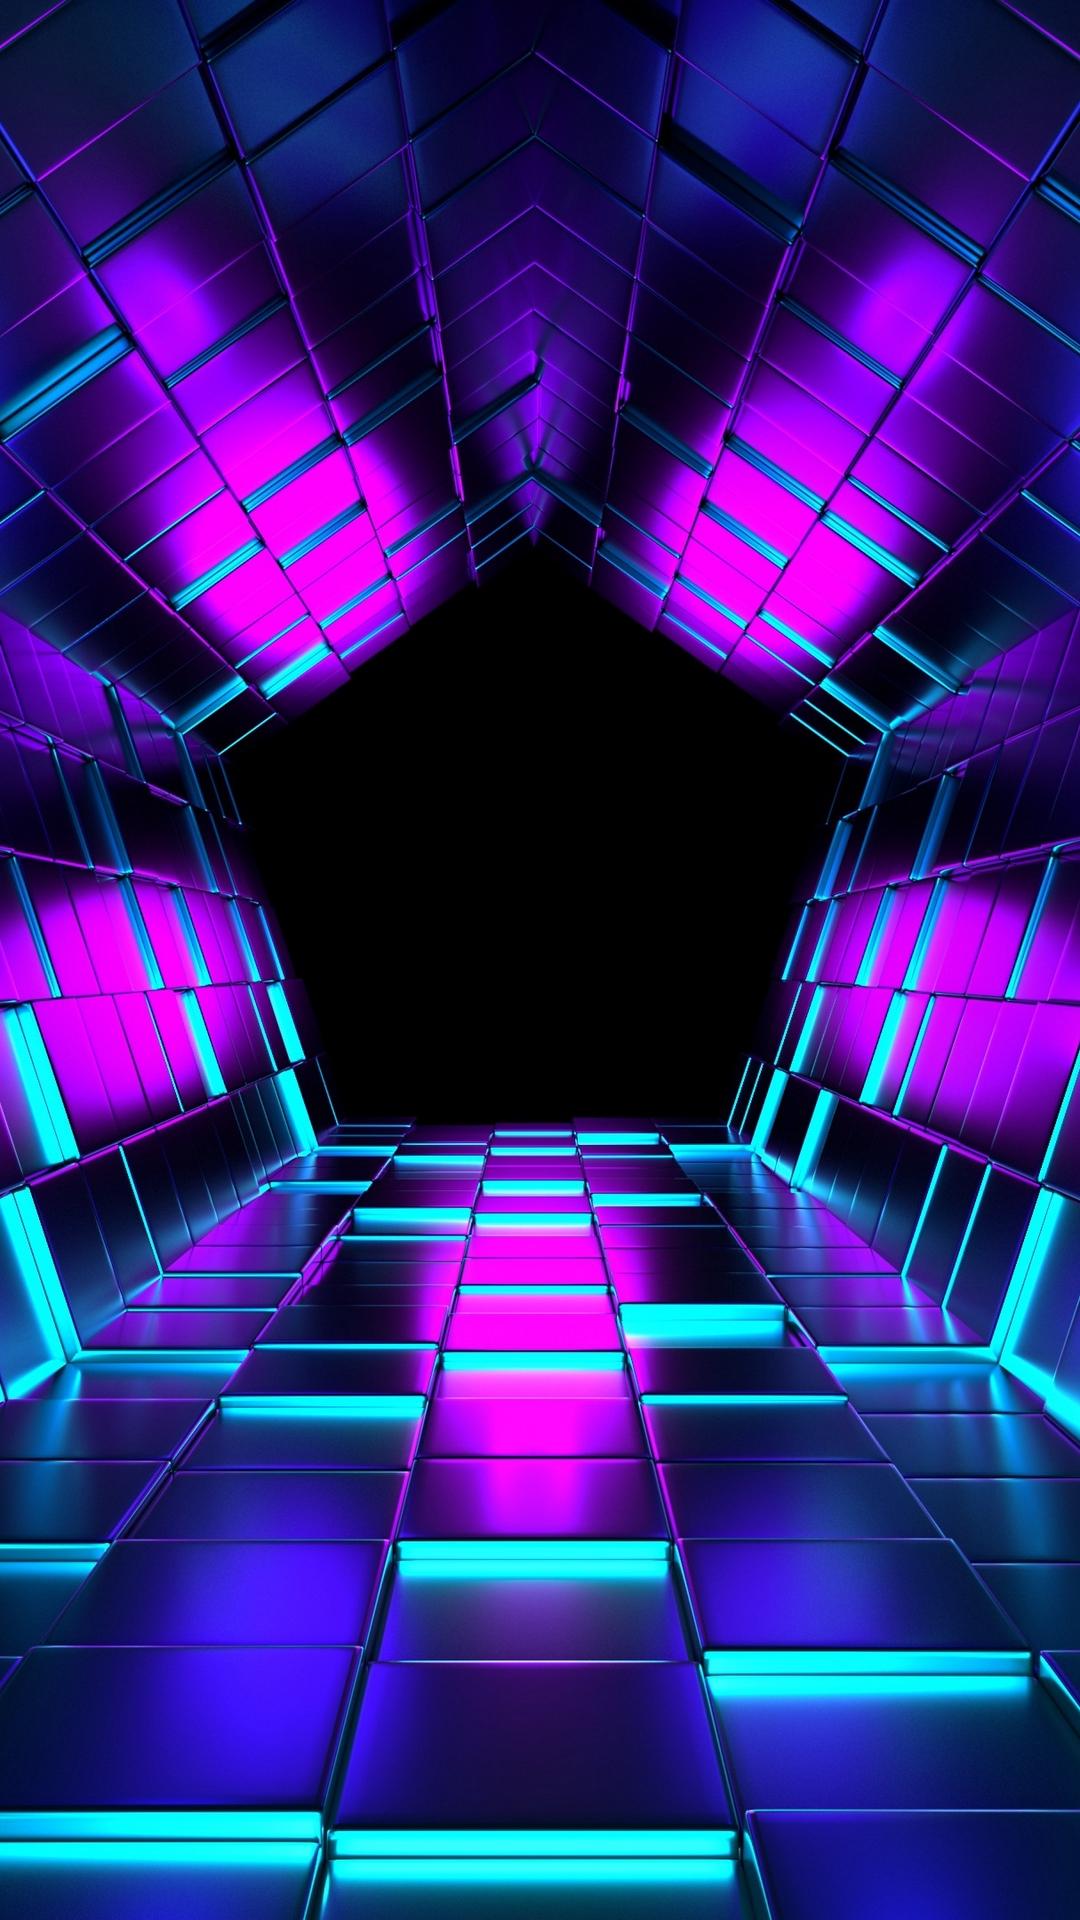 3D Ubes Rendering Tunnel HD Wallpaper - 1080x1920